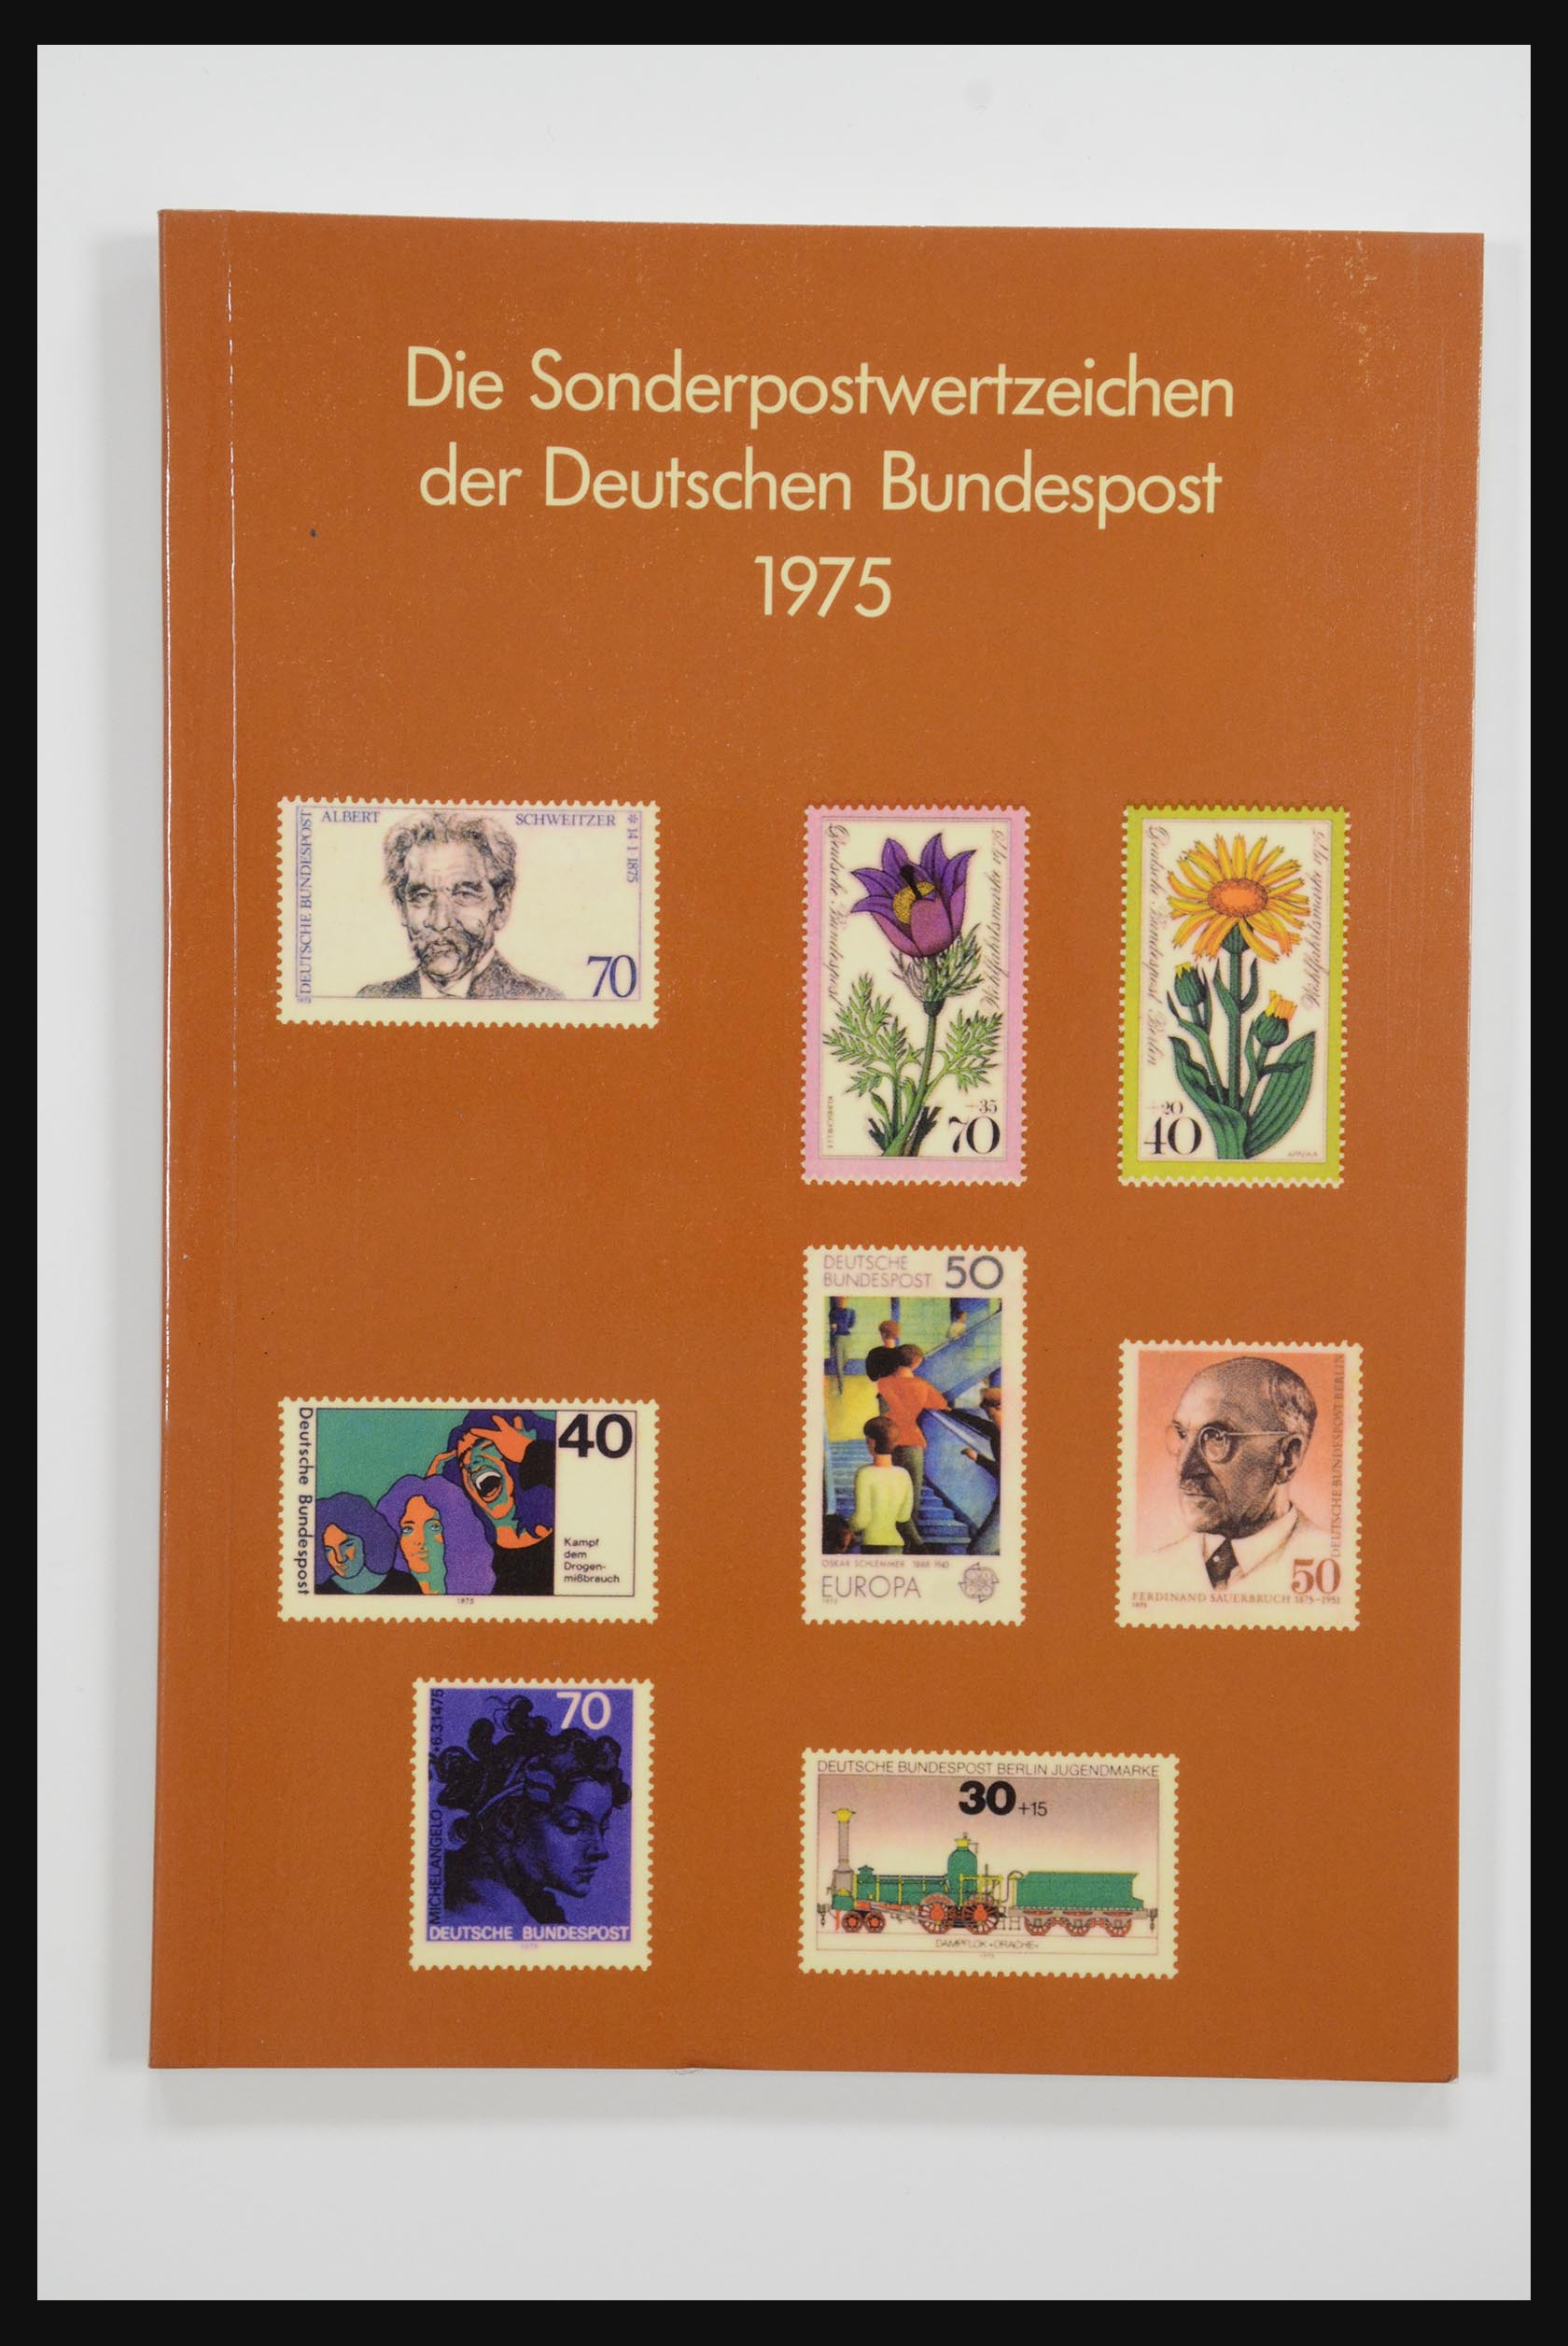 31834 003 - 31834 Bundespost yearbooks 1973(!)-1999.